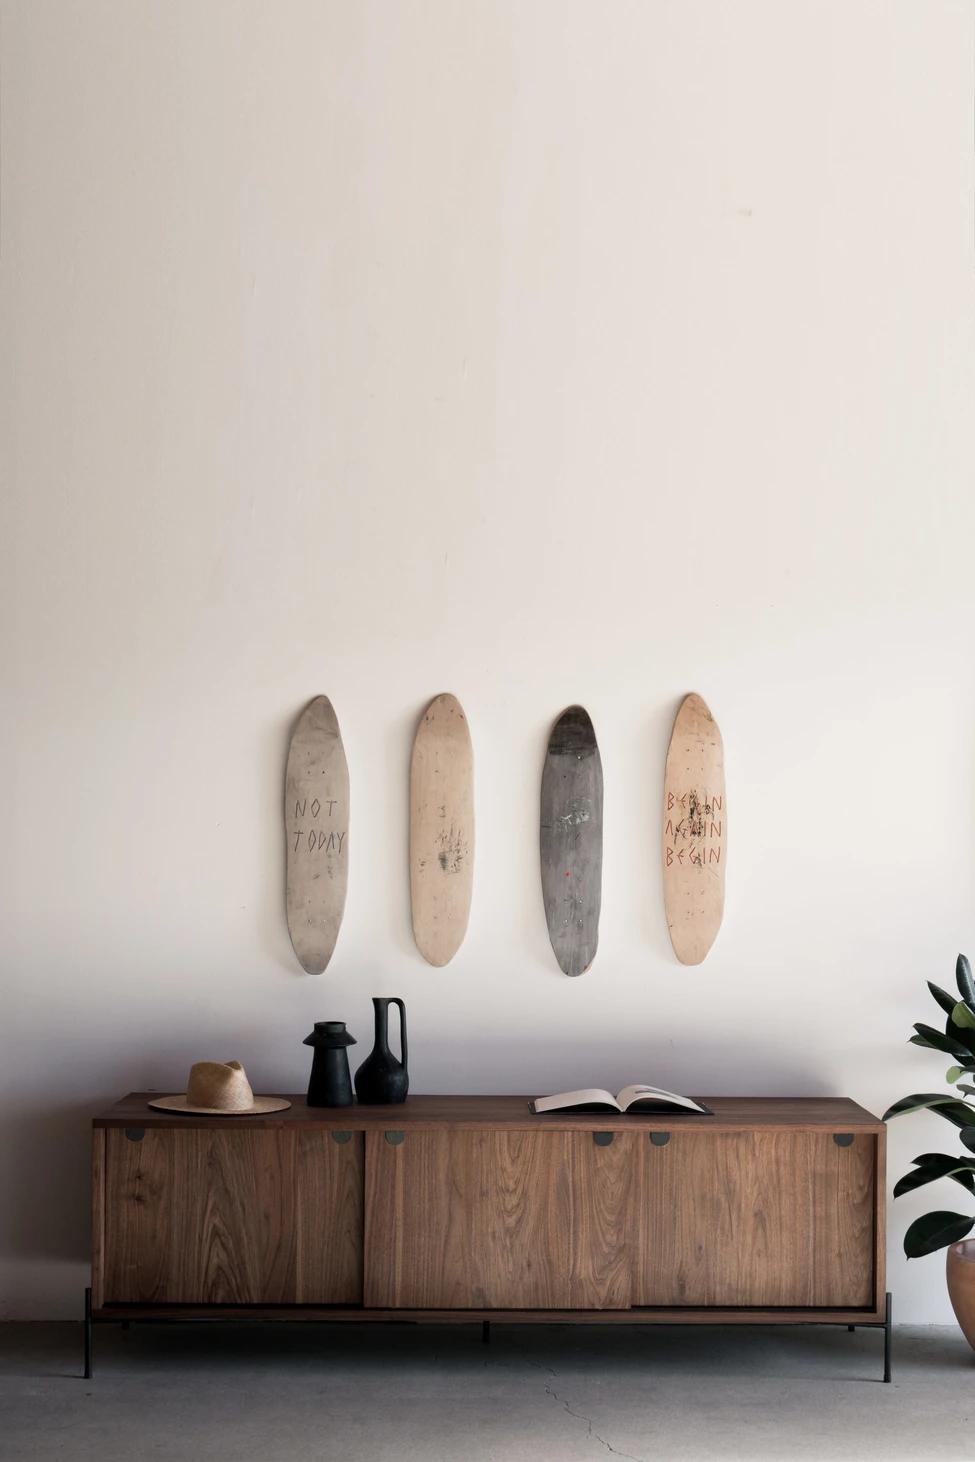 Spaulding Credenza In 2020 Contemporary Home Decor Contemporary Interior Design Contemporary Interior